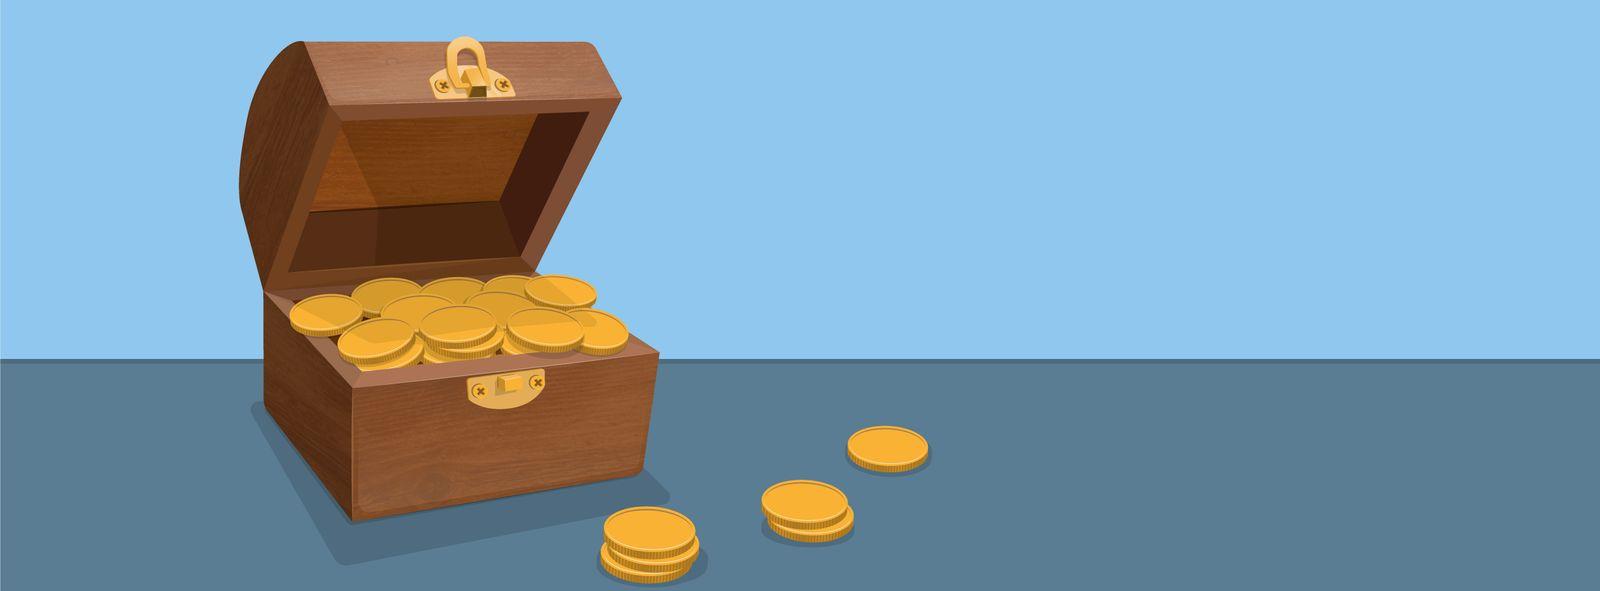 Rätsel der Woche - Gold Erbe